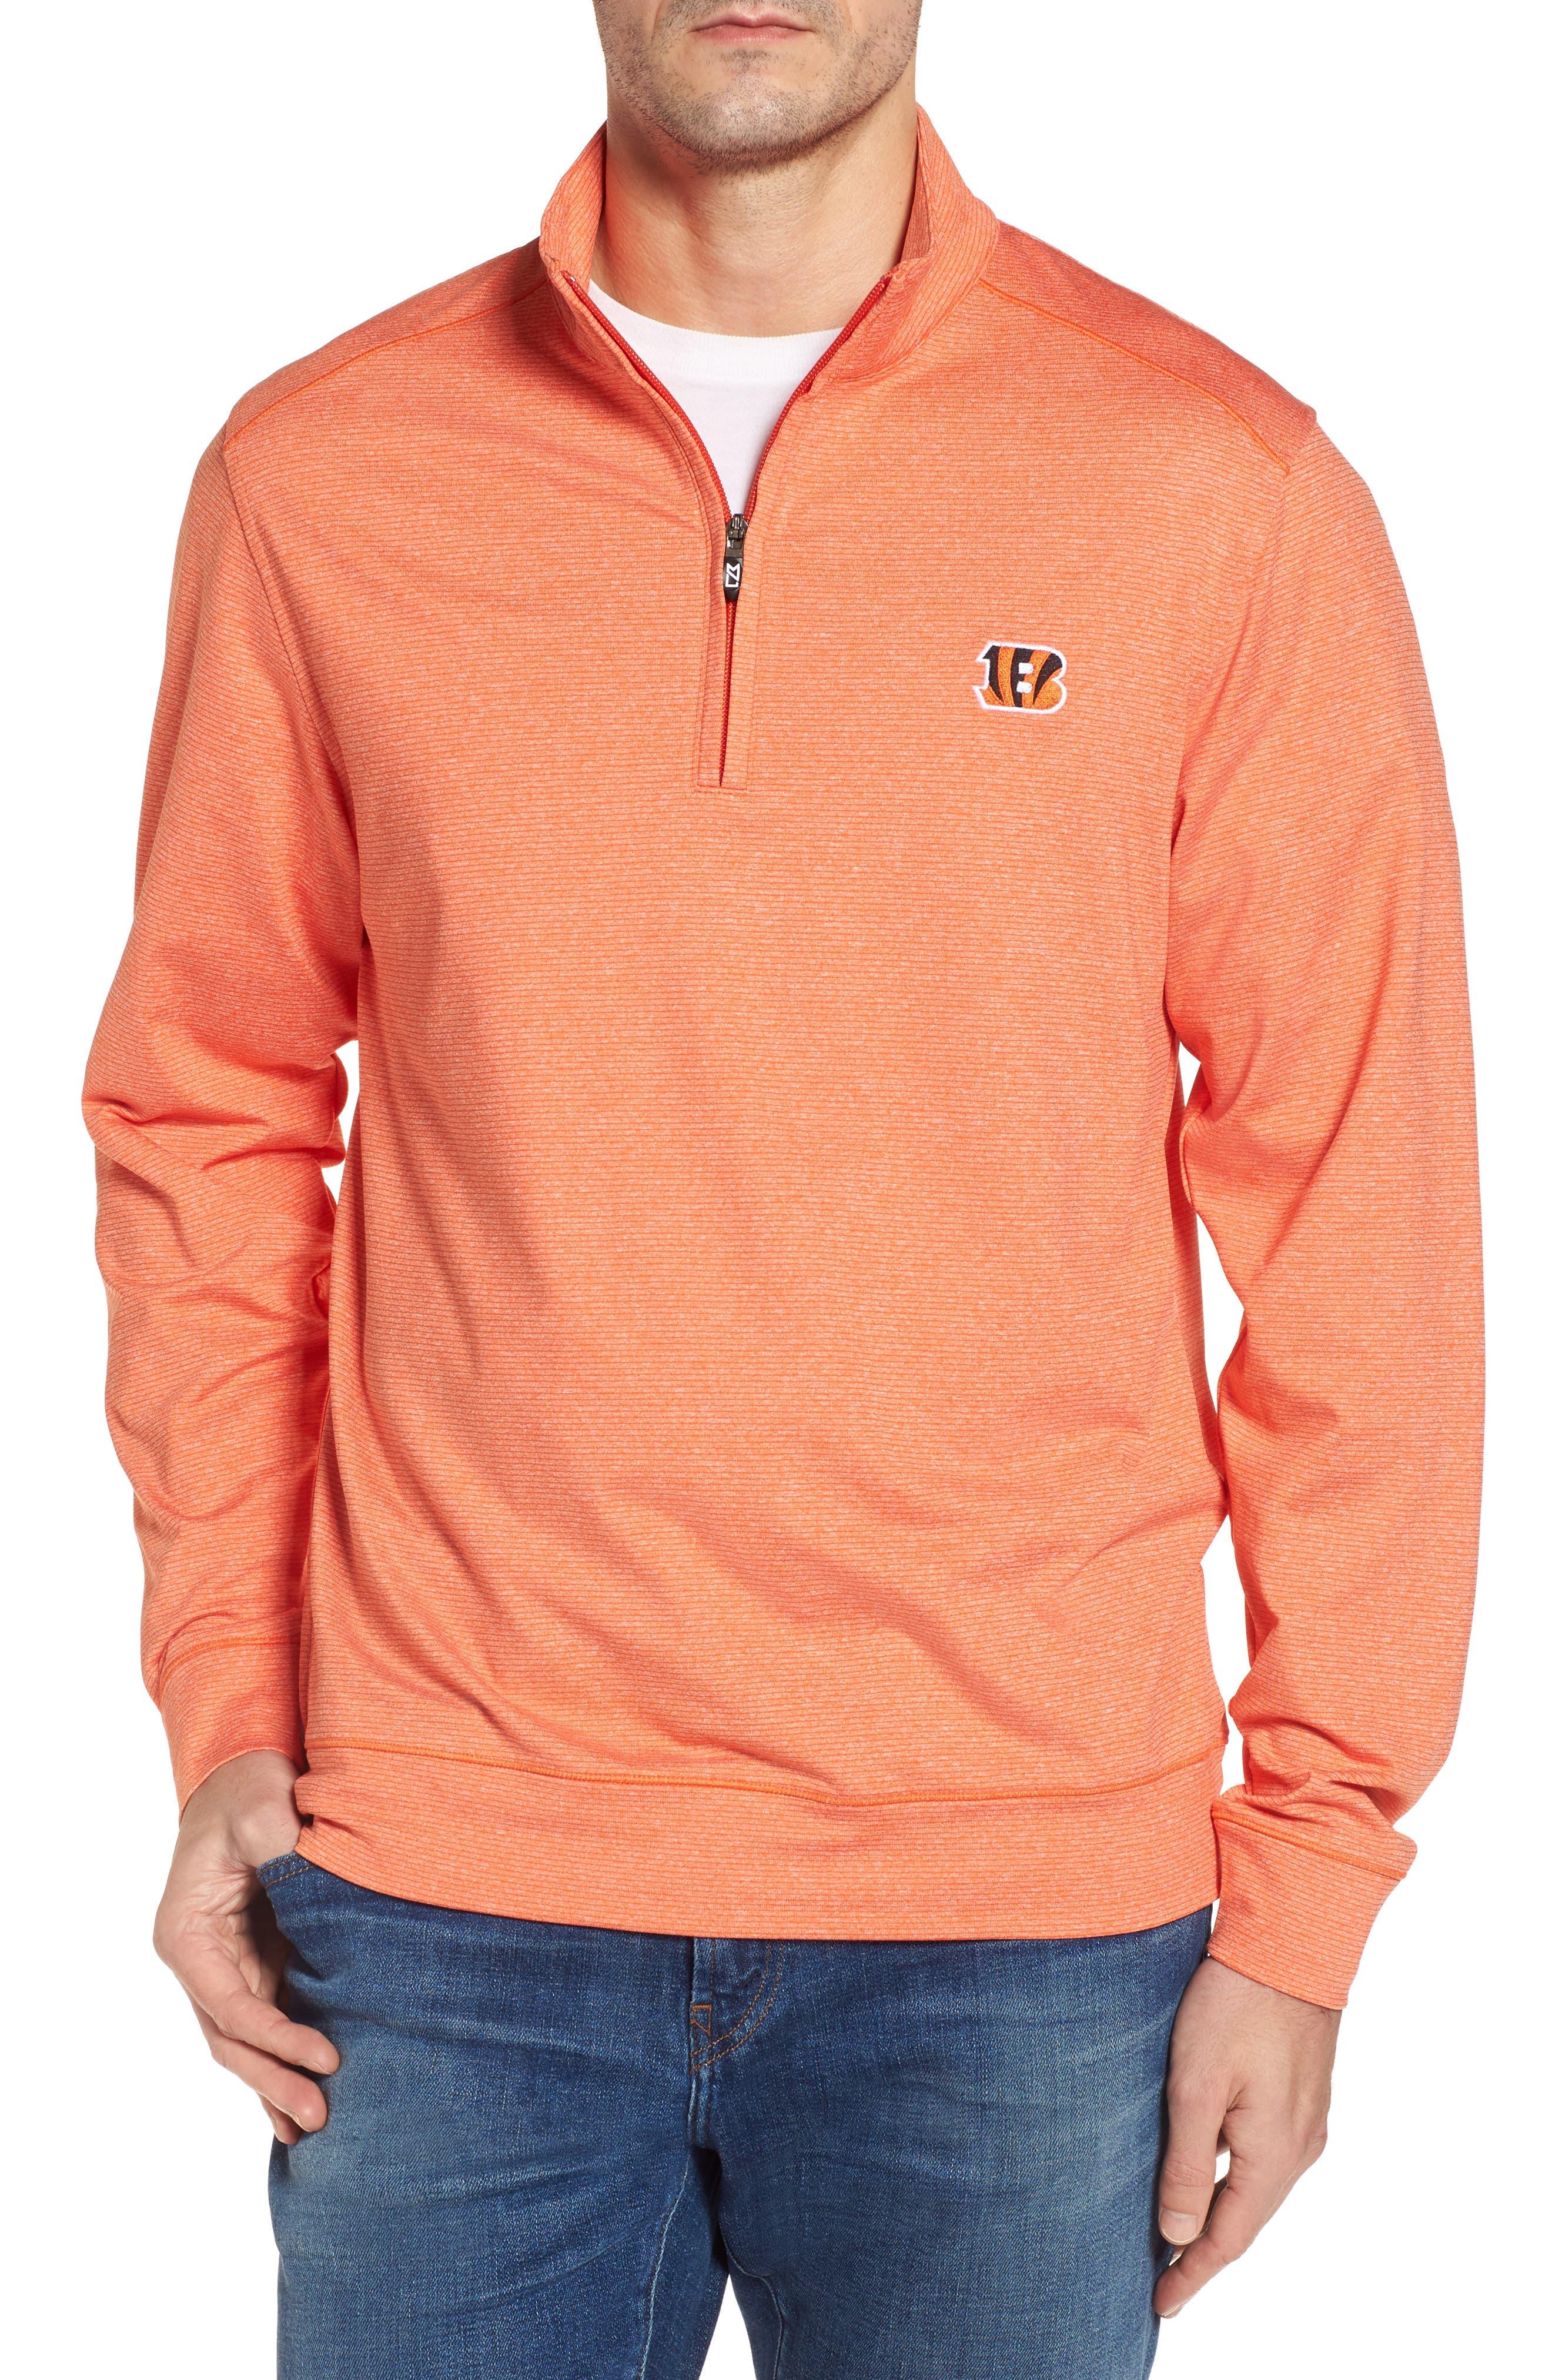 Shoreline - Cincinnati Bengals Half Zip Pullover,                         Main,                         color, College Orange Heather